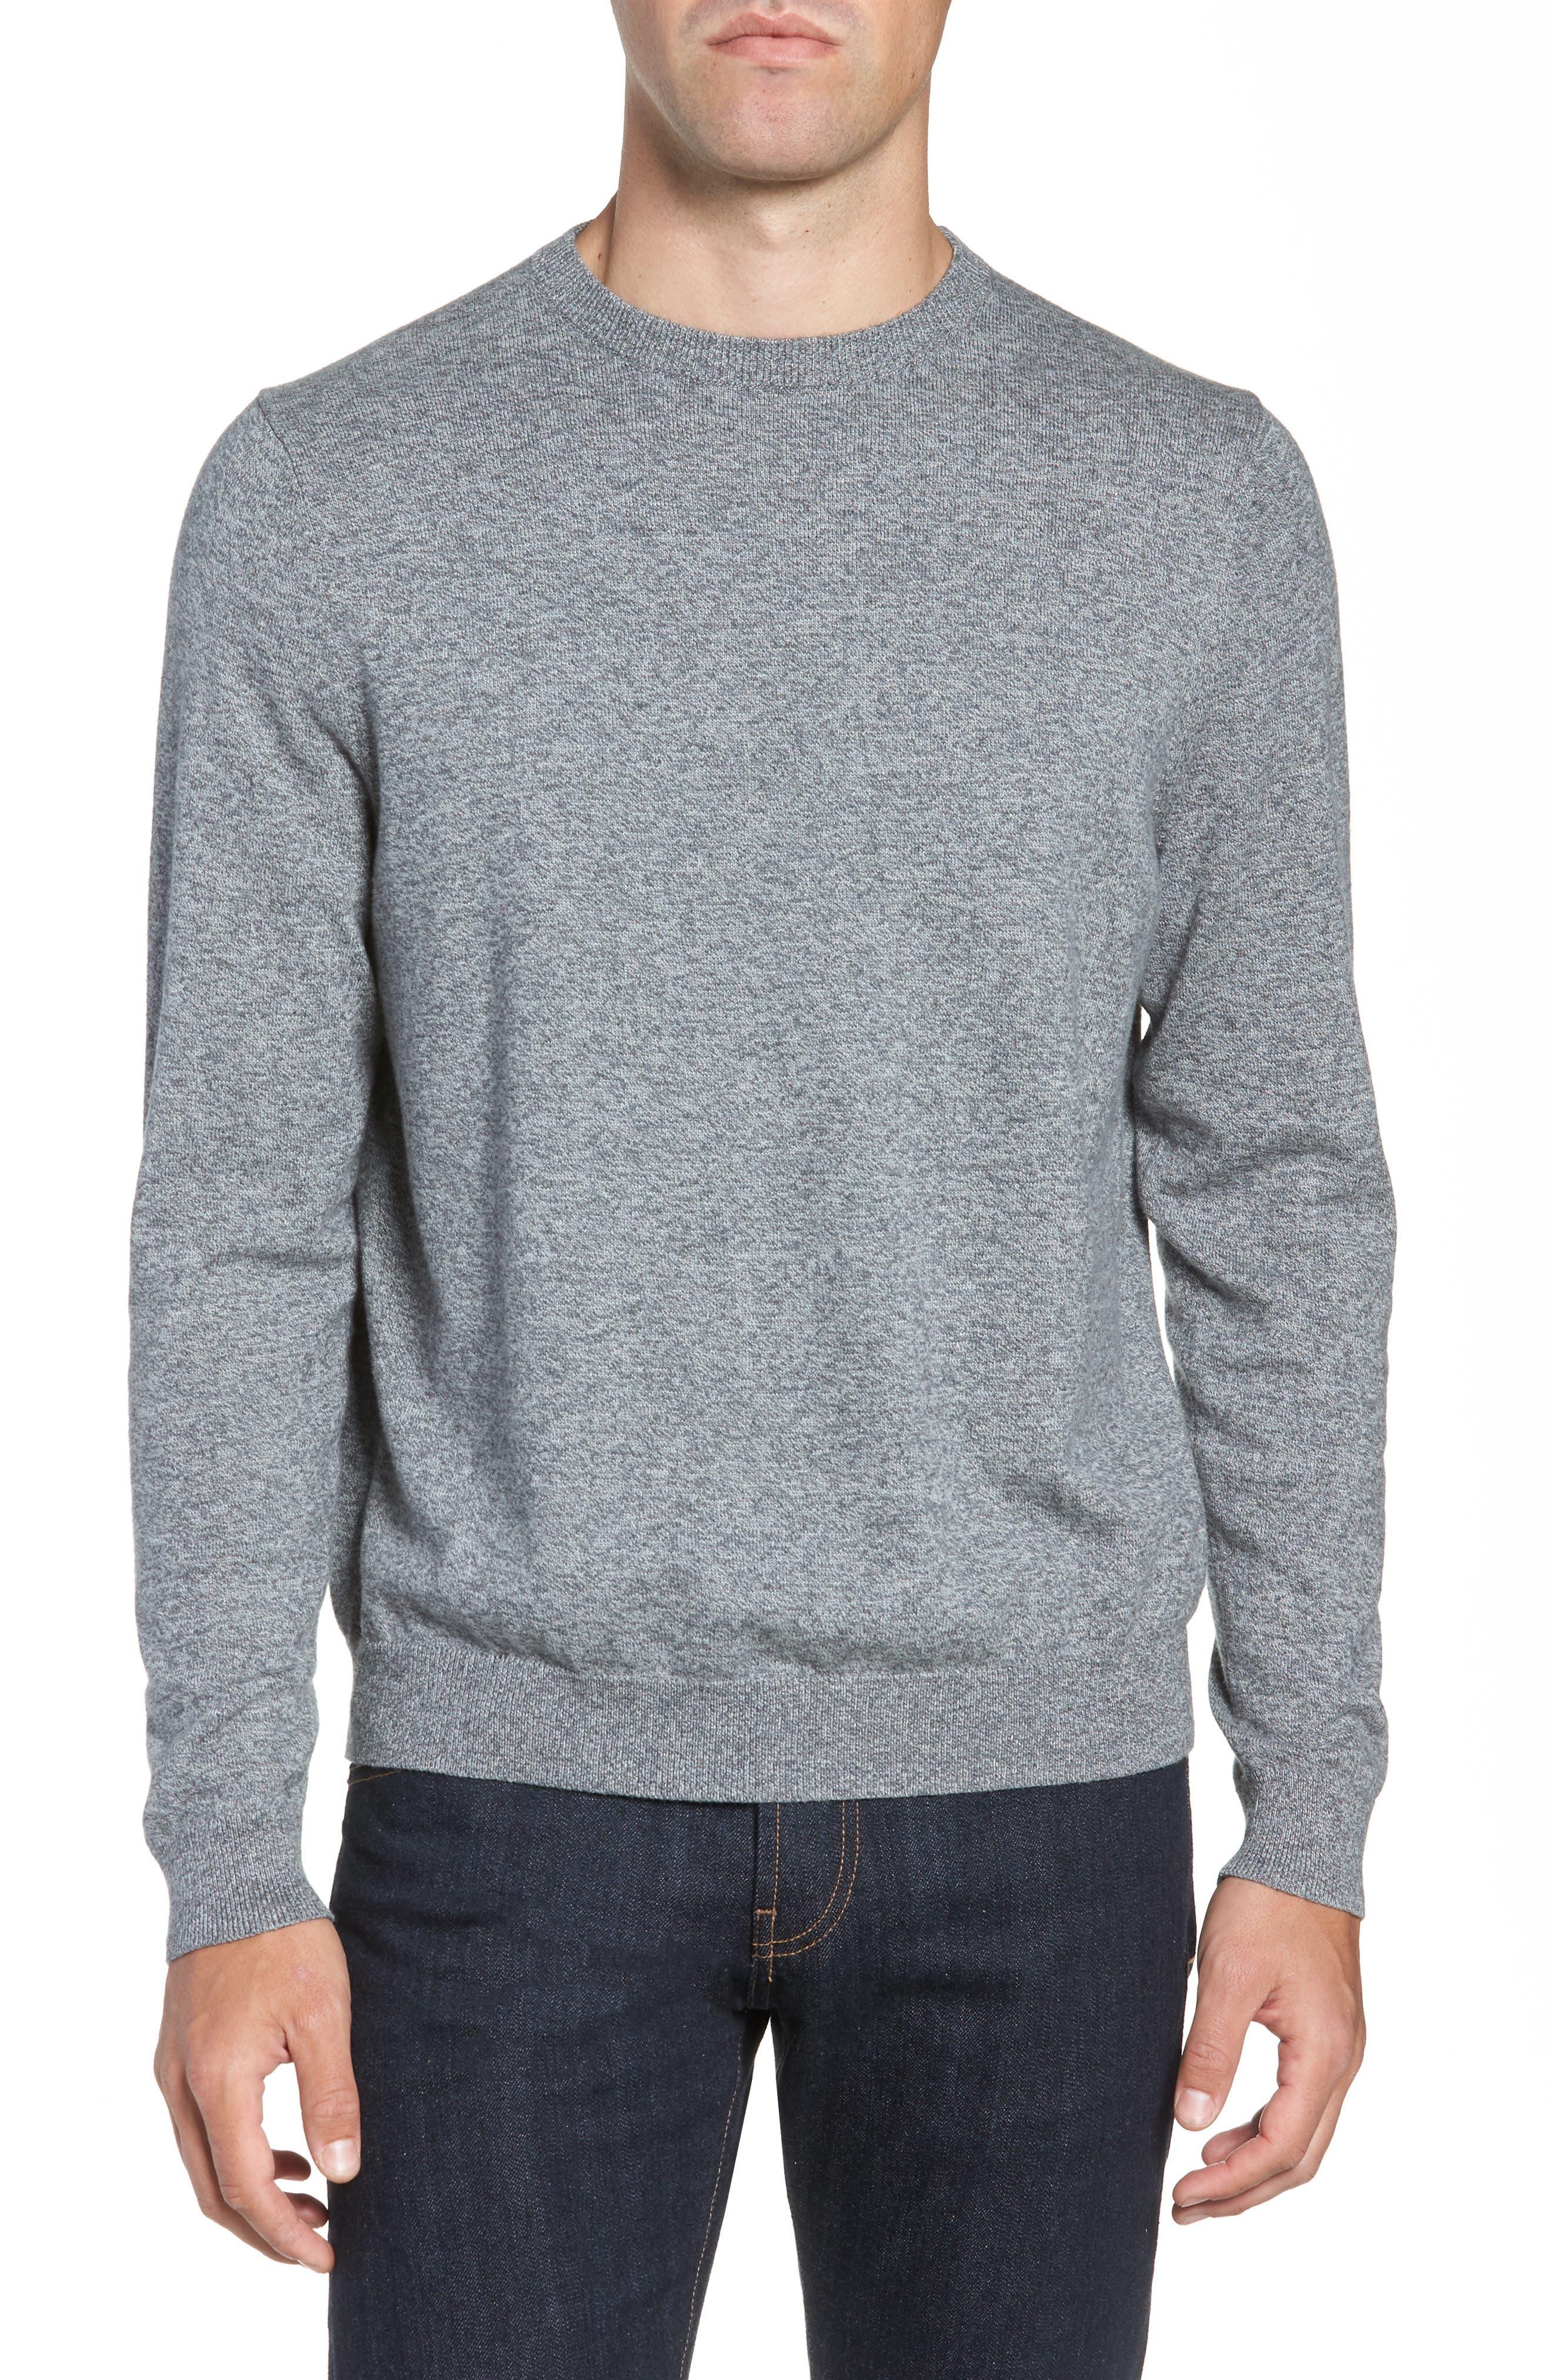 NORDSTROM MEN'S SHOP Cotton & Cashmere Crewneck Sweater, Main, color, GREY SHADE MARL